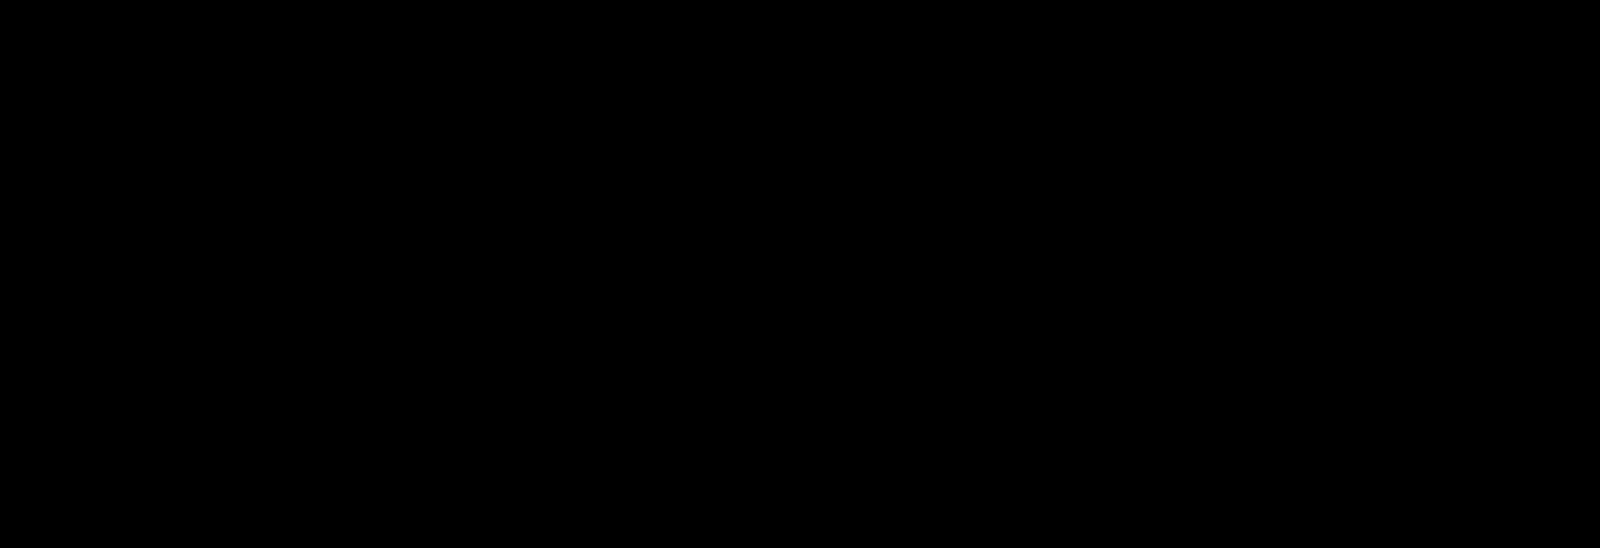 scuto logo